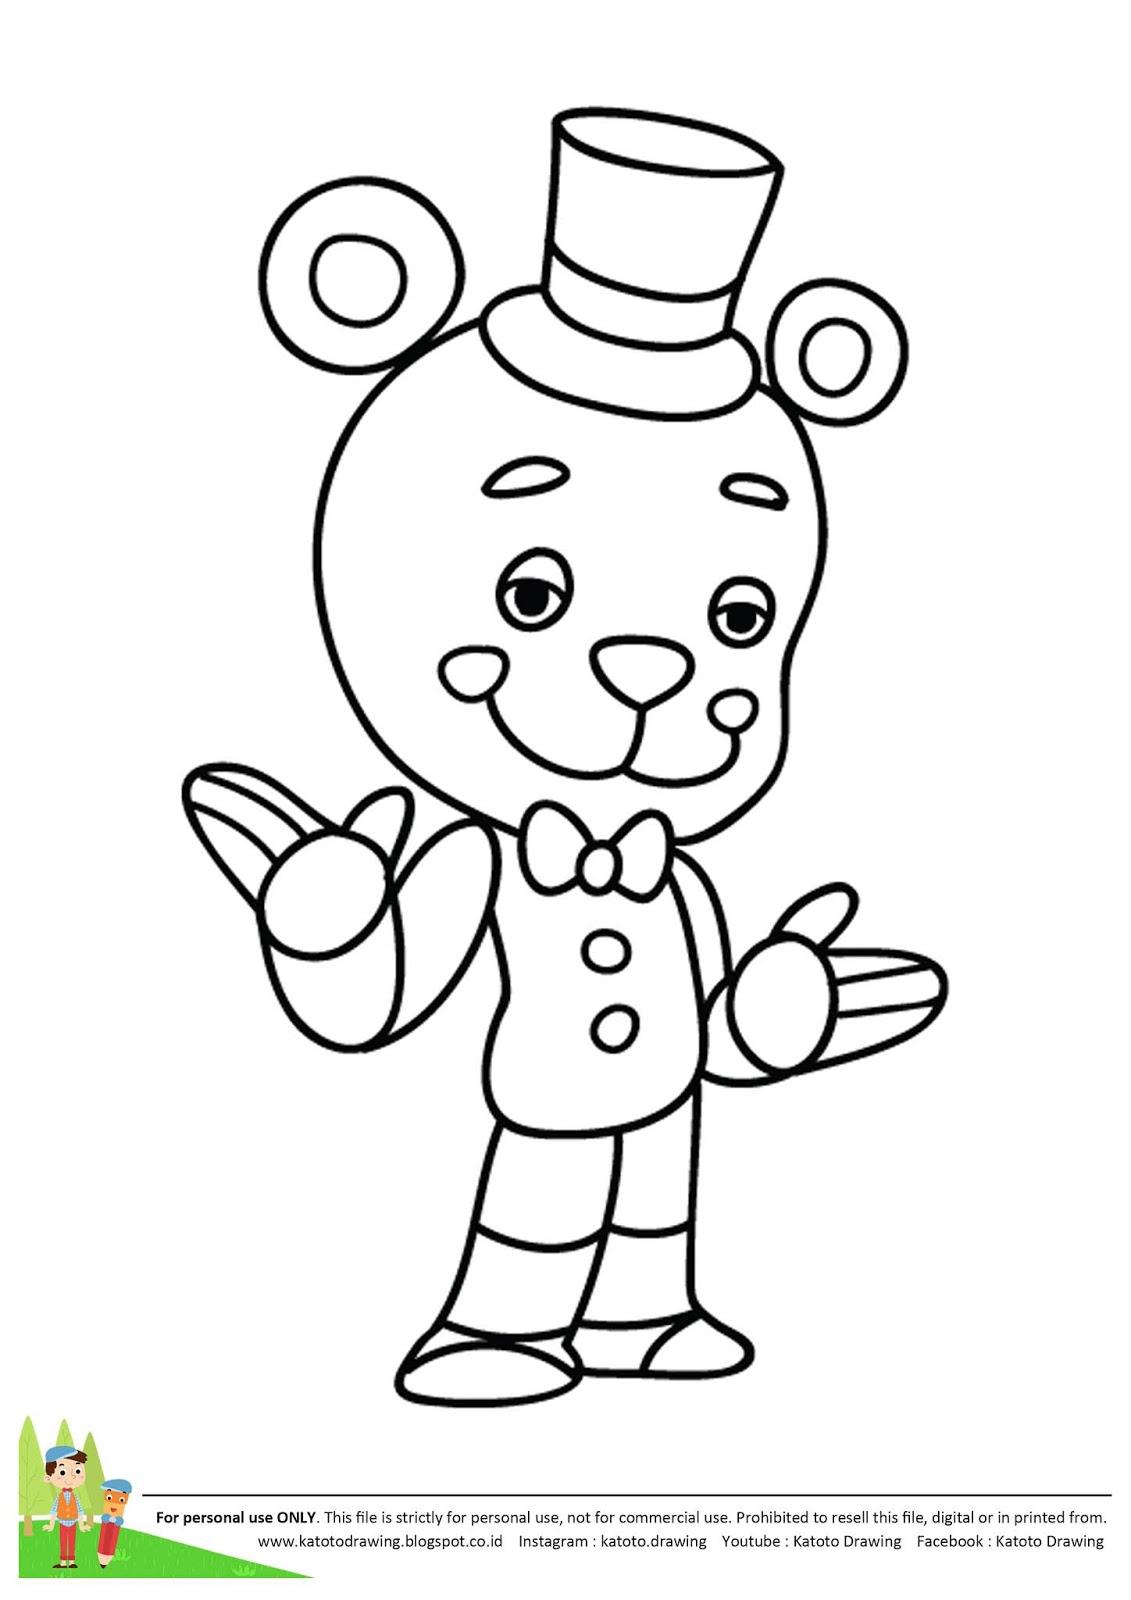 image relating to Free Printable Five Nights at Freddy's Coloring Pages called Katoto Drawing Guideline: Langkah menggambar dan mewarnai